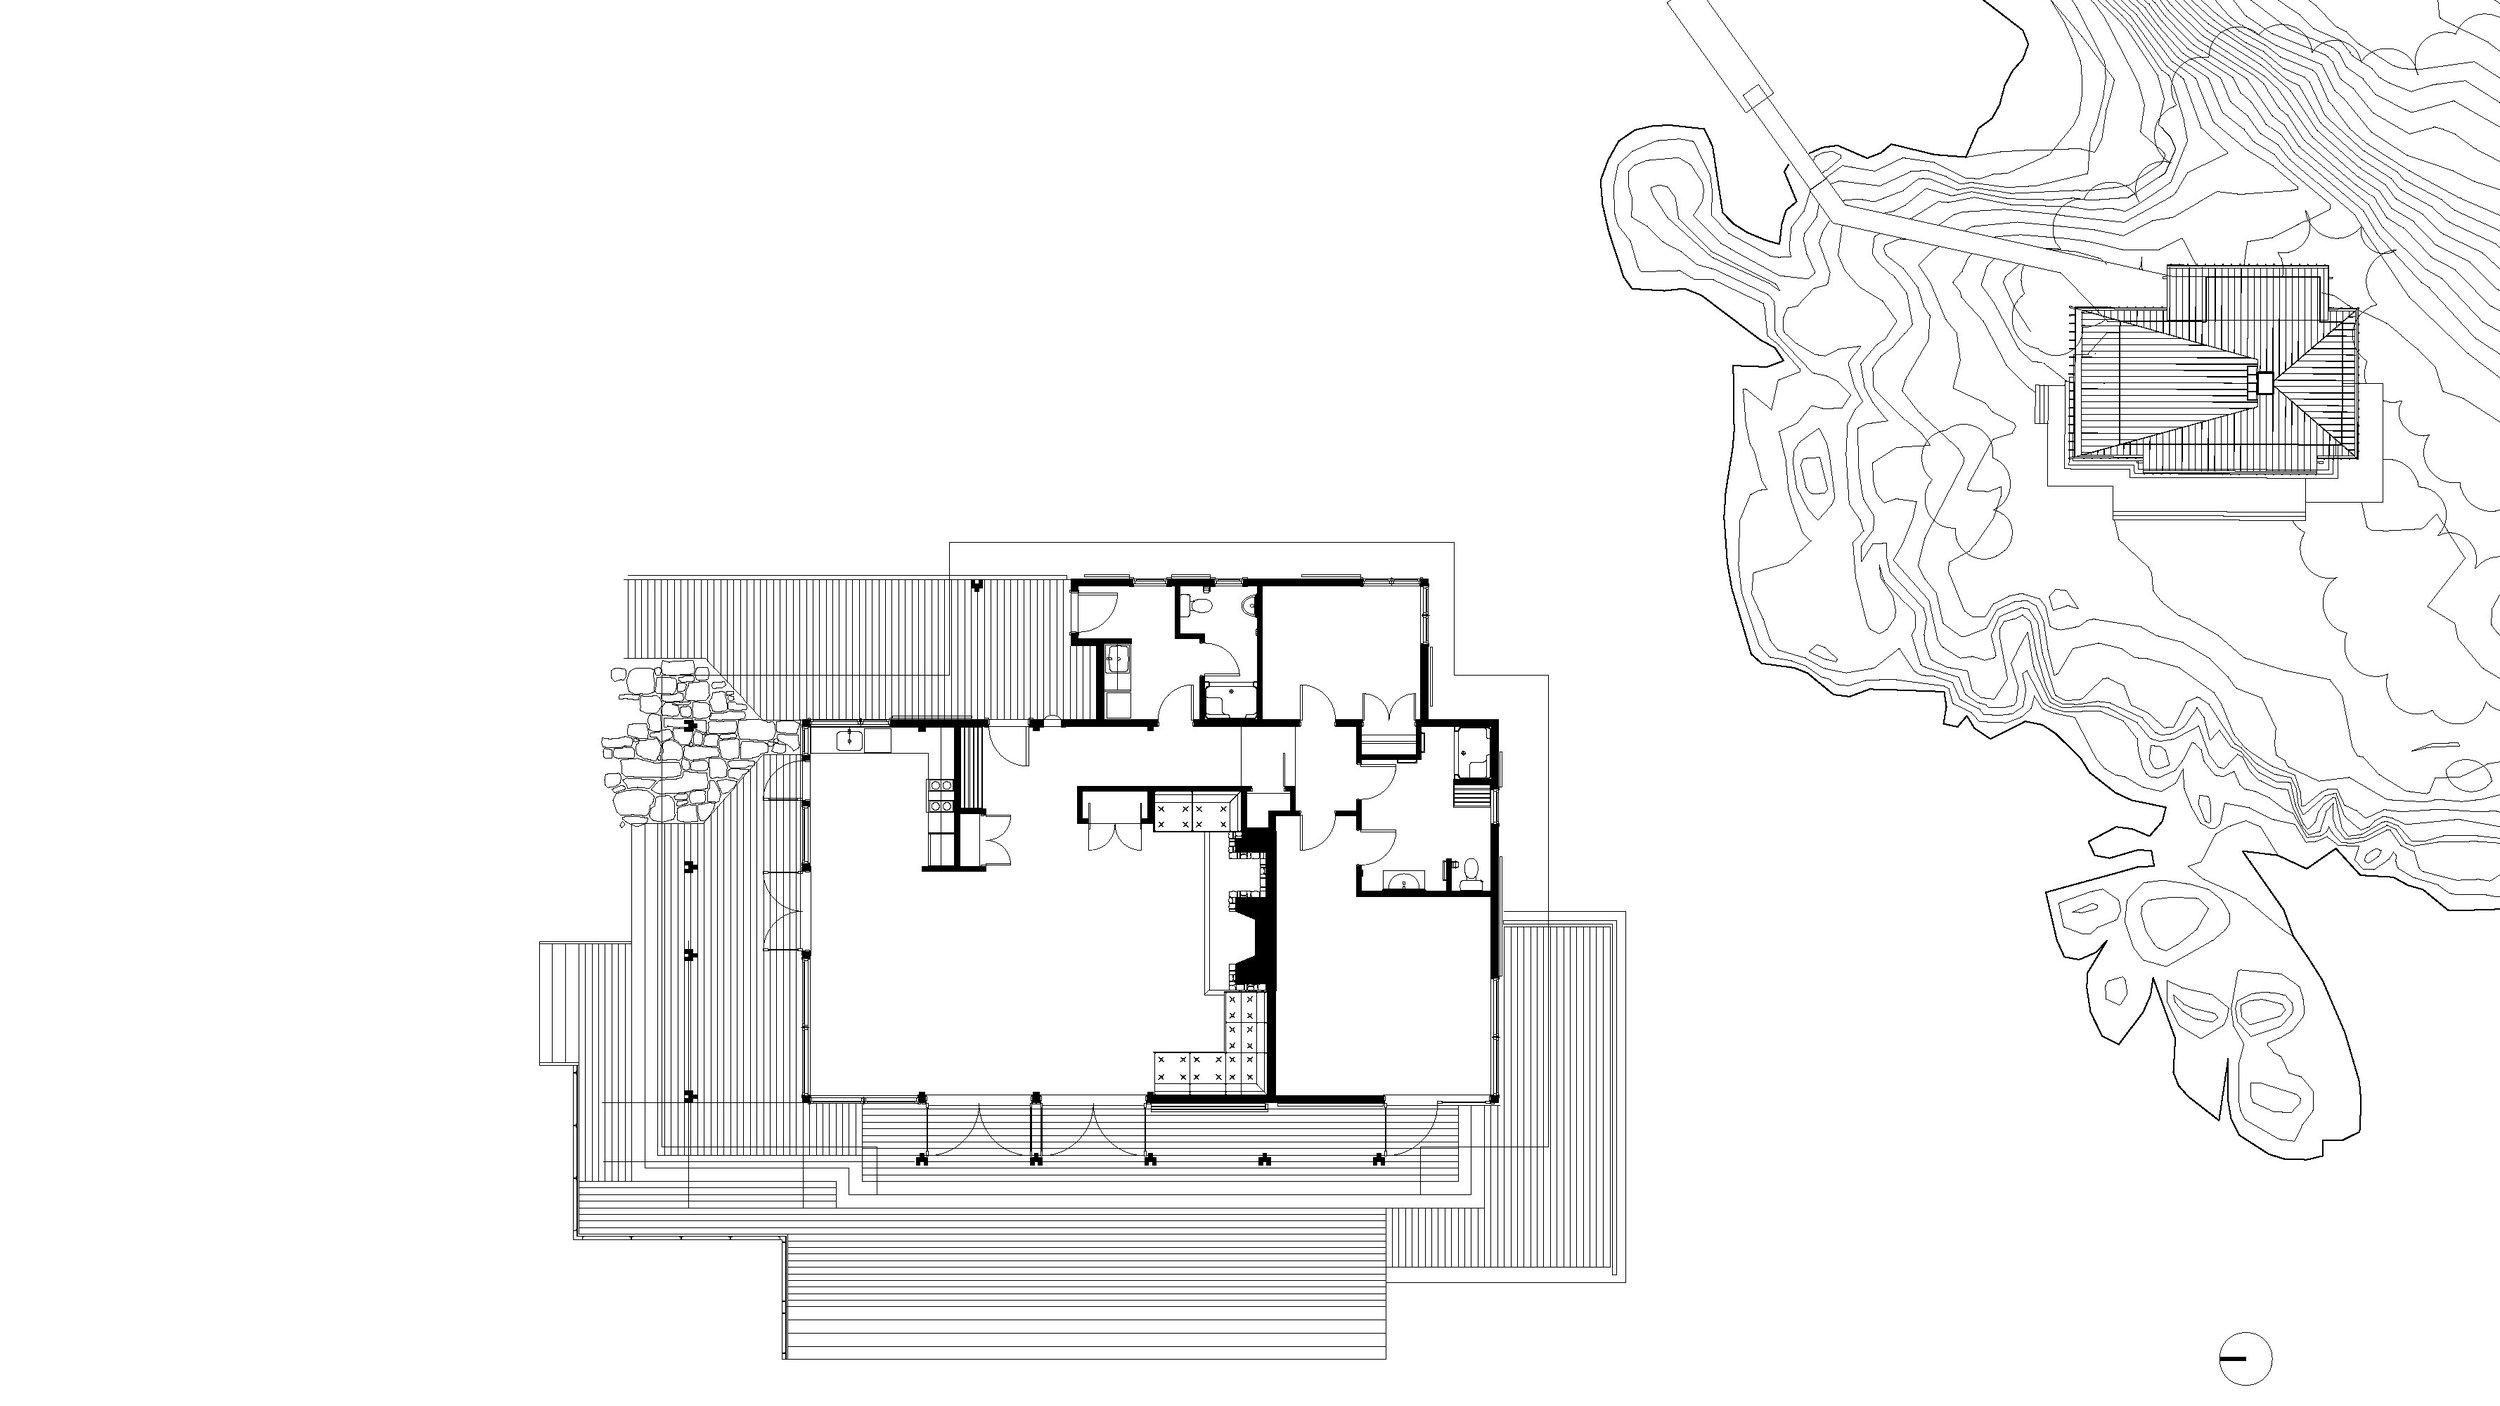 01_02_11_Rubly_Plan.jpg